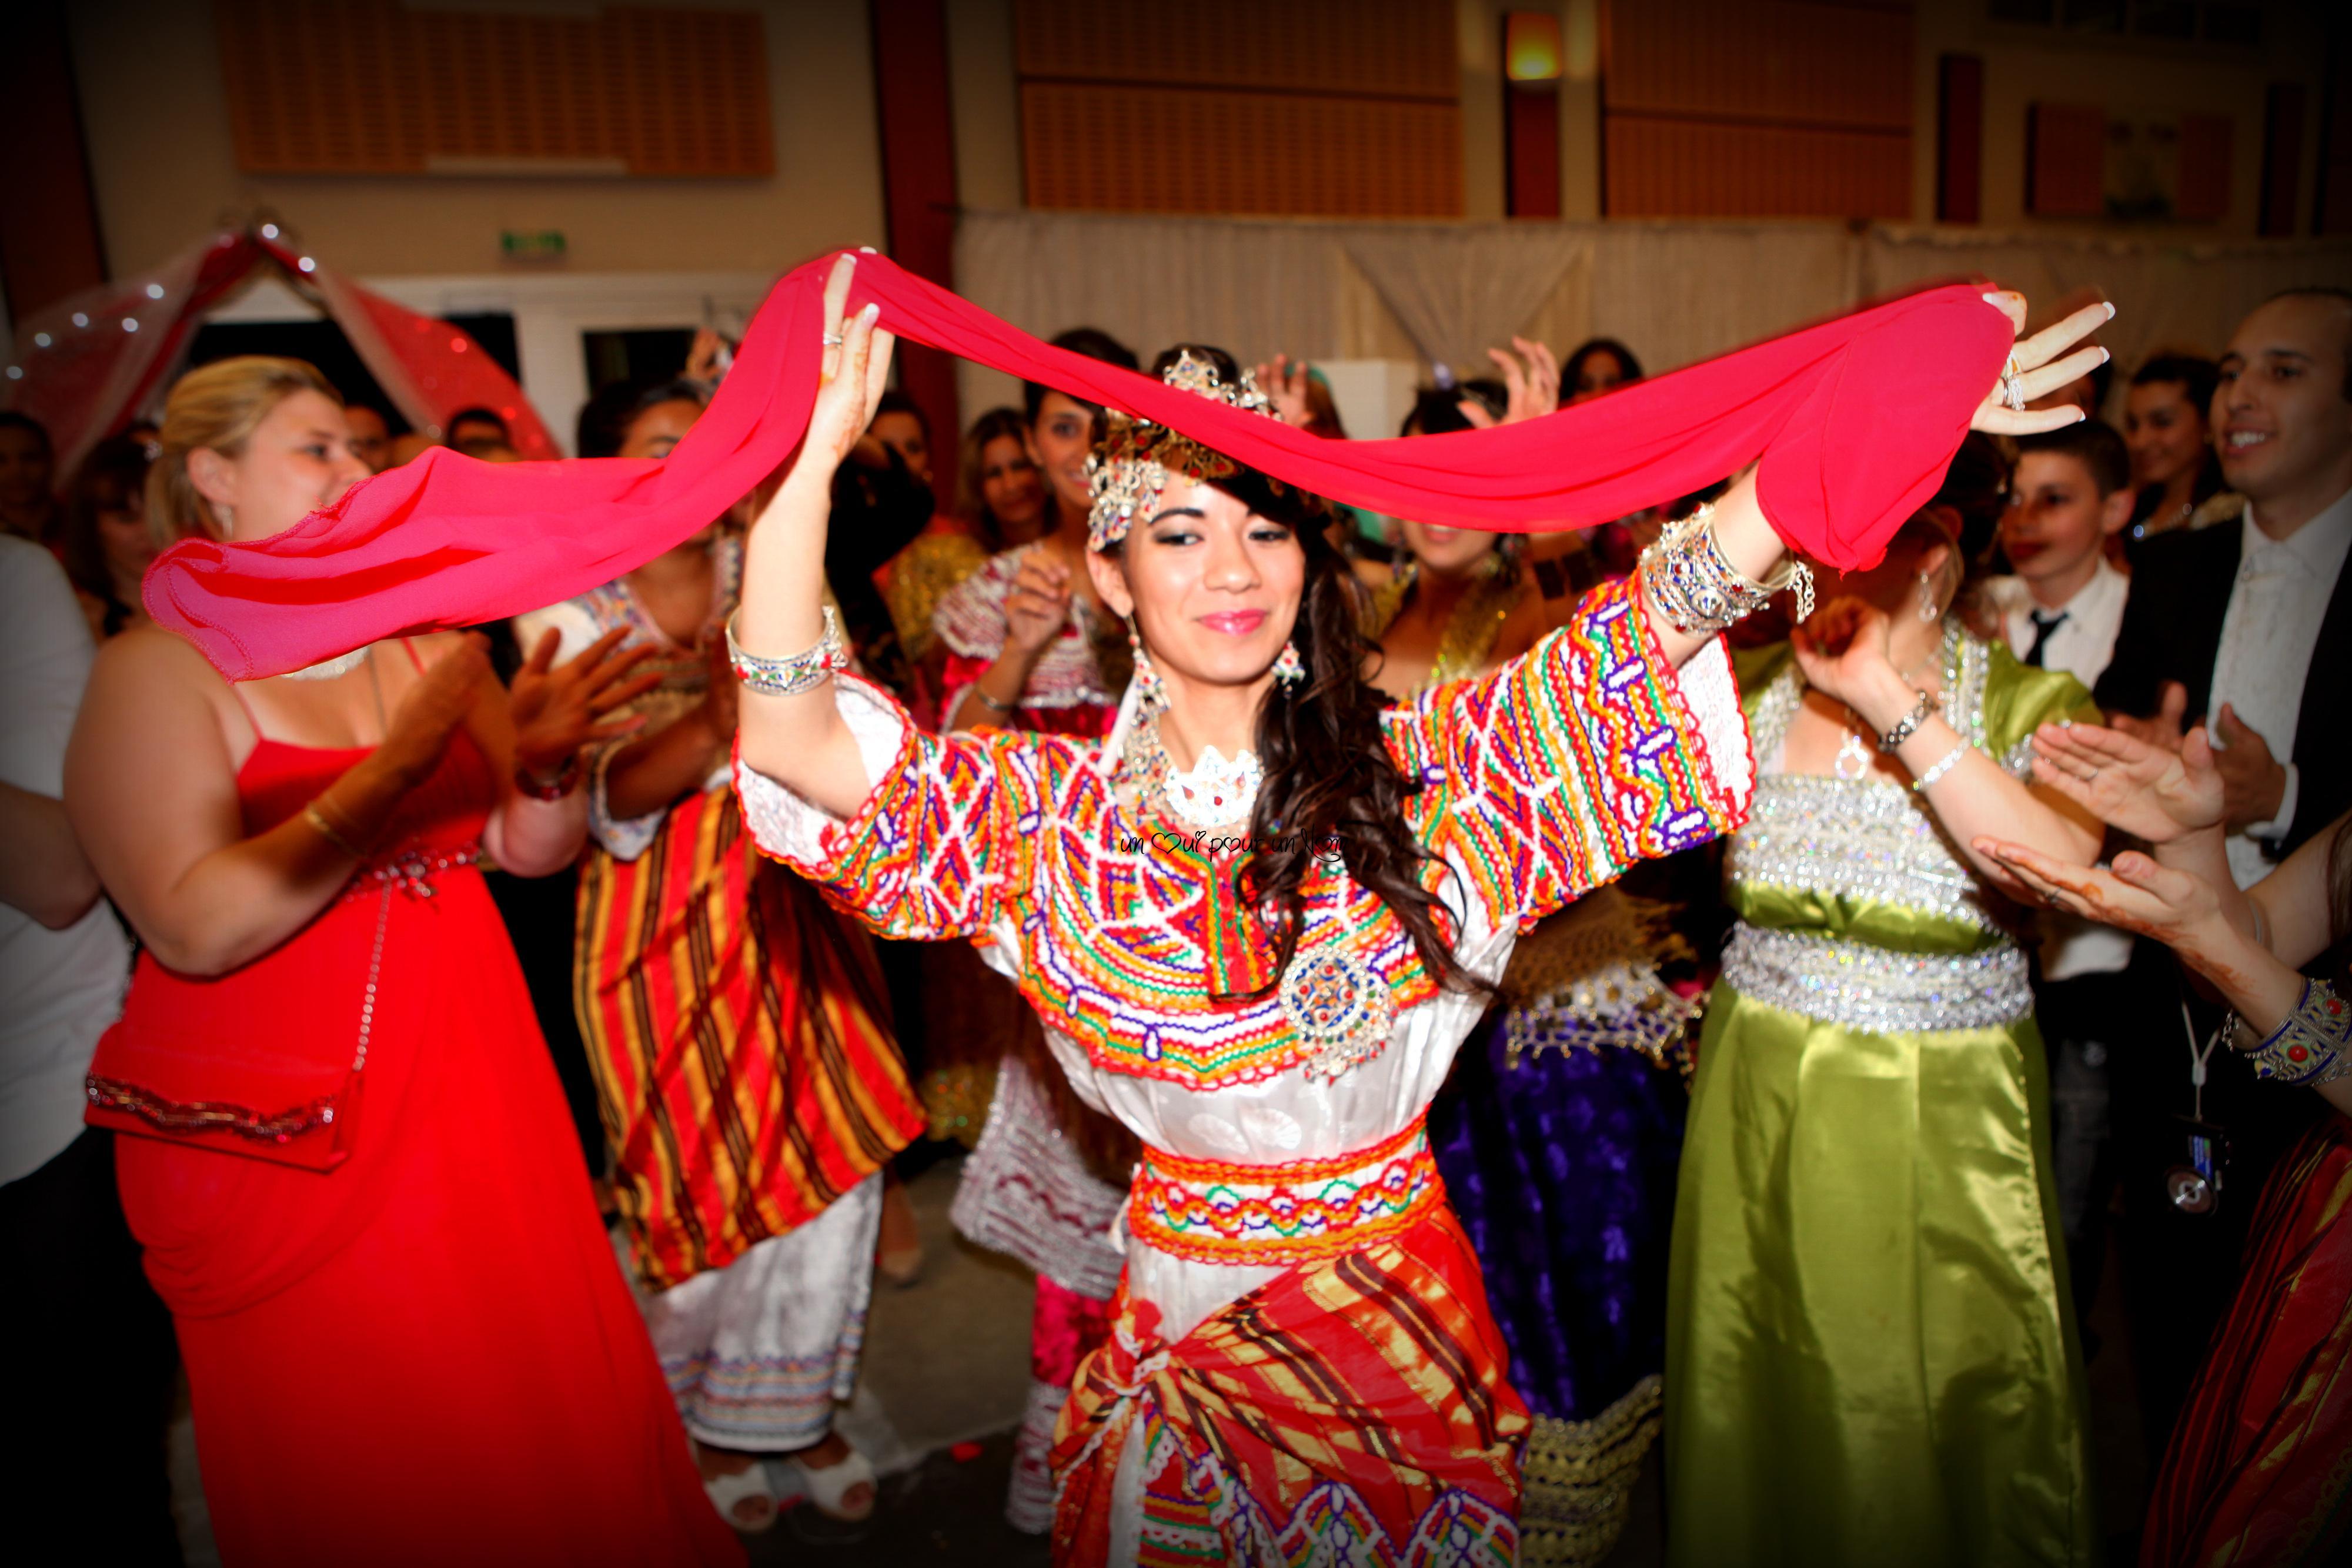 photographe cameraman mariage kabyle